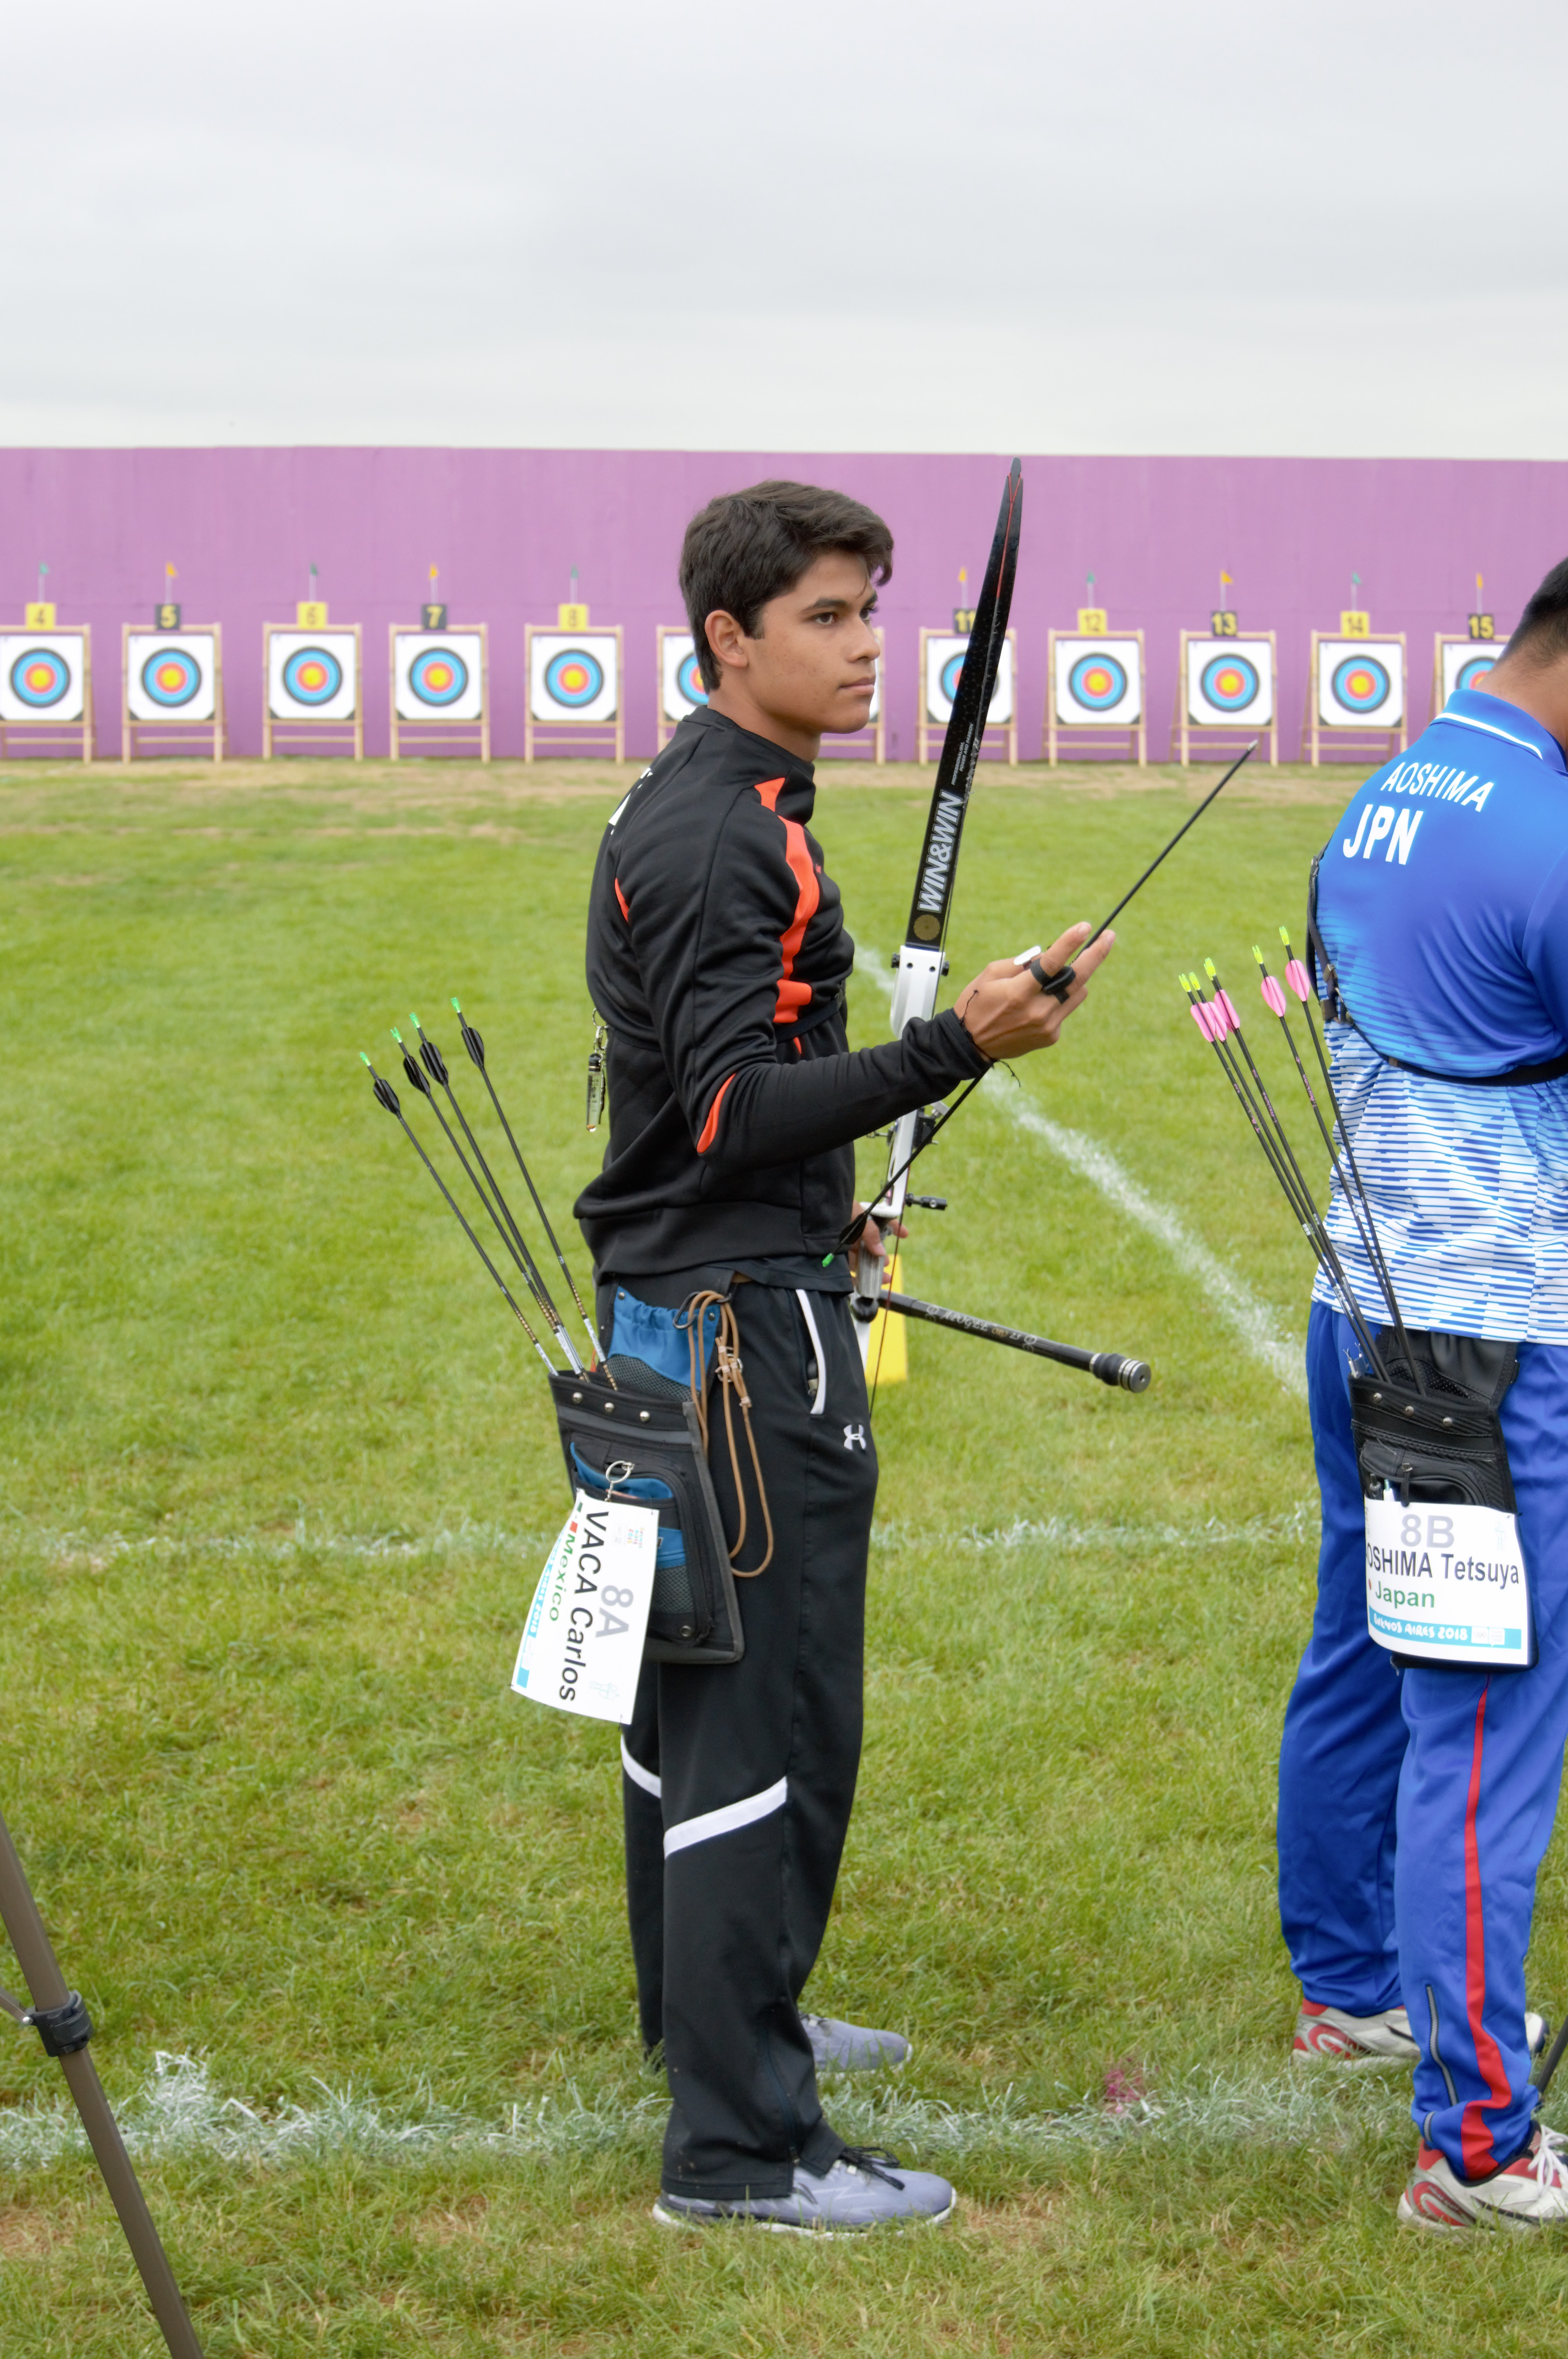 File:First day of Archery 2018 YOG (101) jpg - Wikimedia Commons